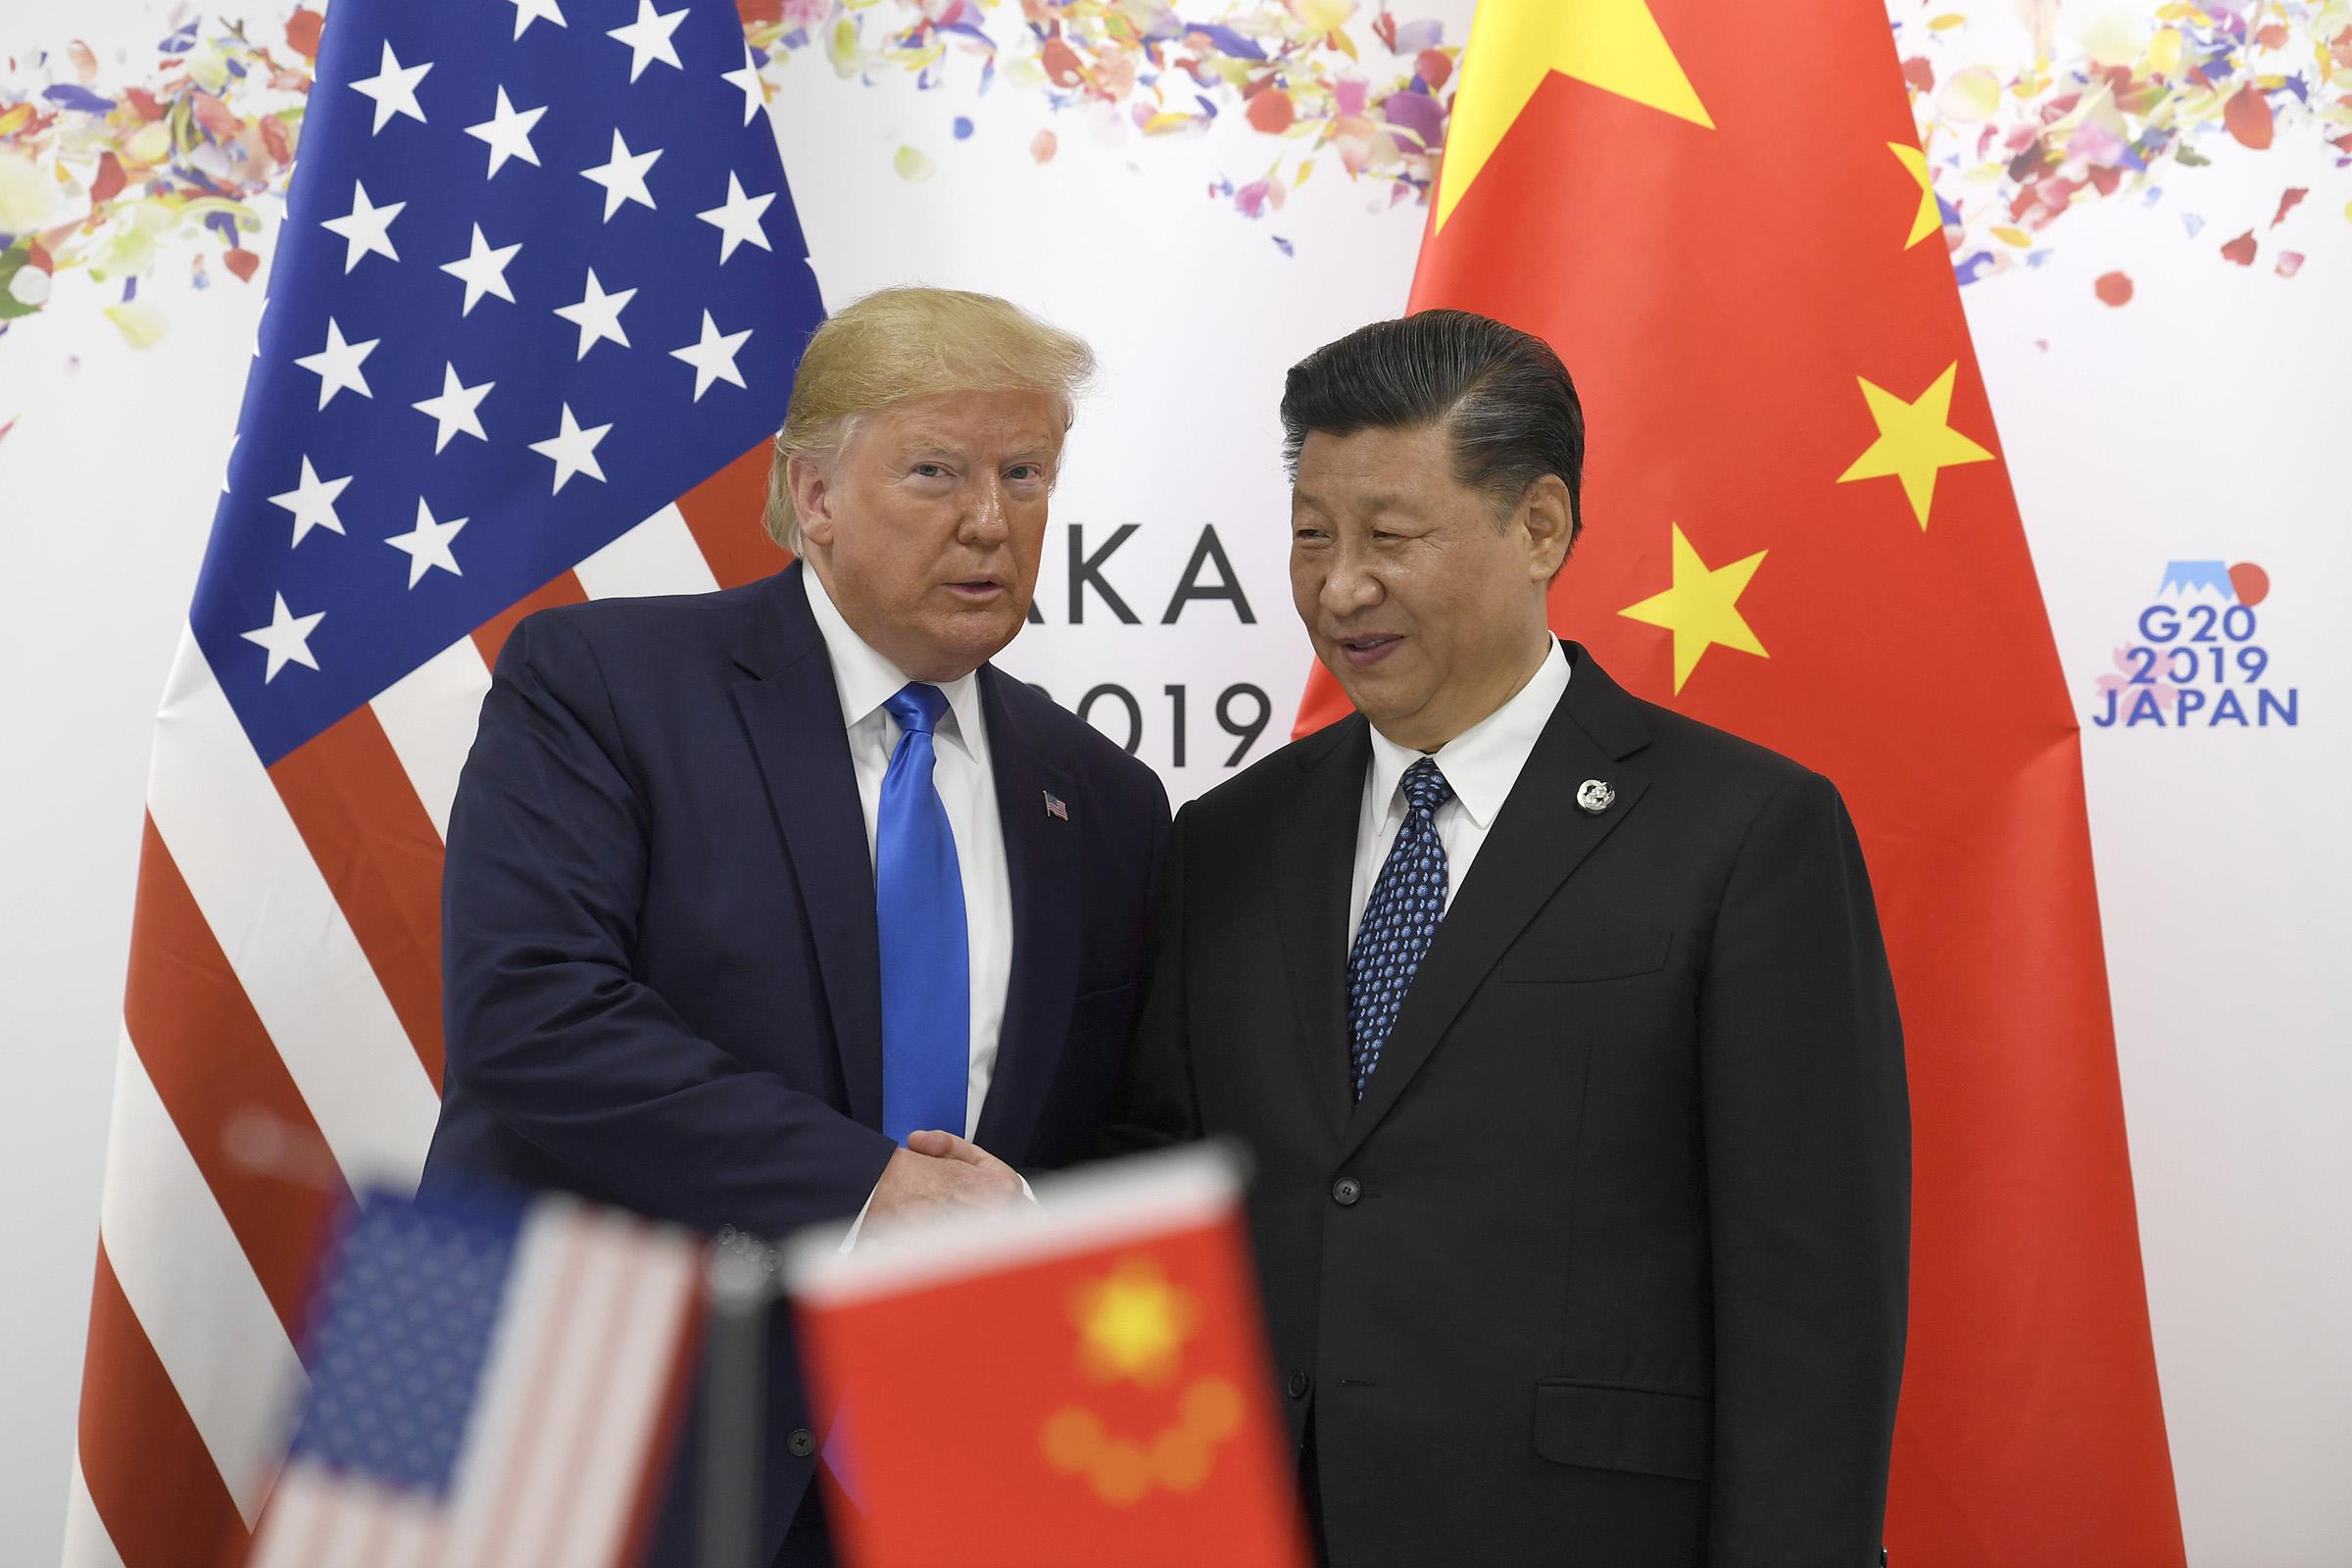 President Trump North Korea gave Kim Jong vertex A 'de facto status of a nuclear state', Ban Ki-moon says